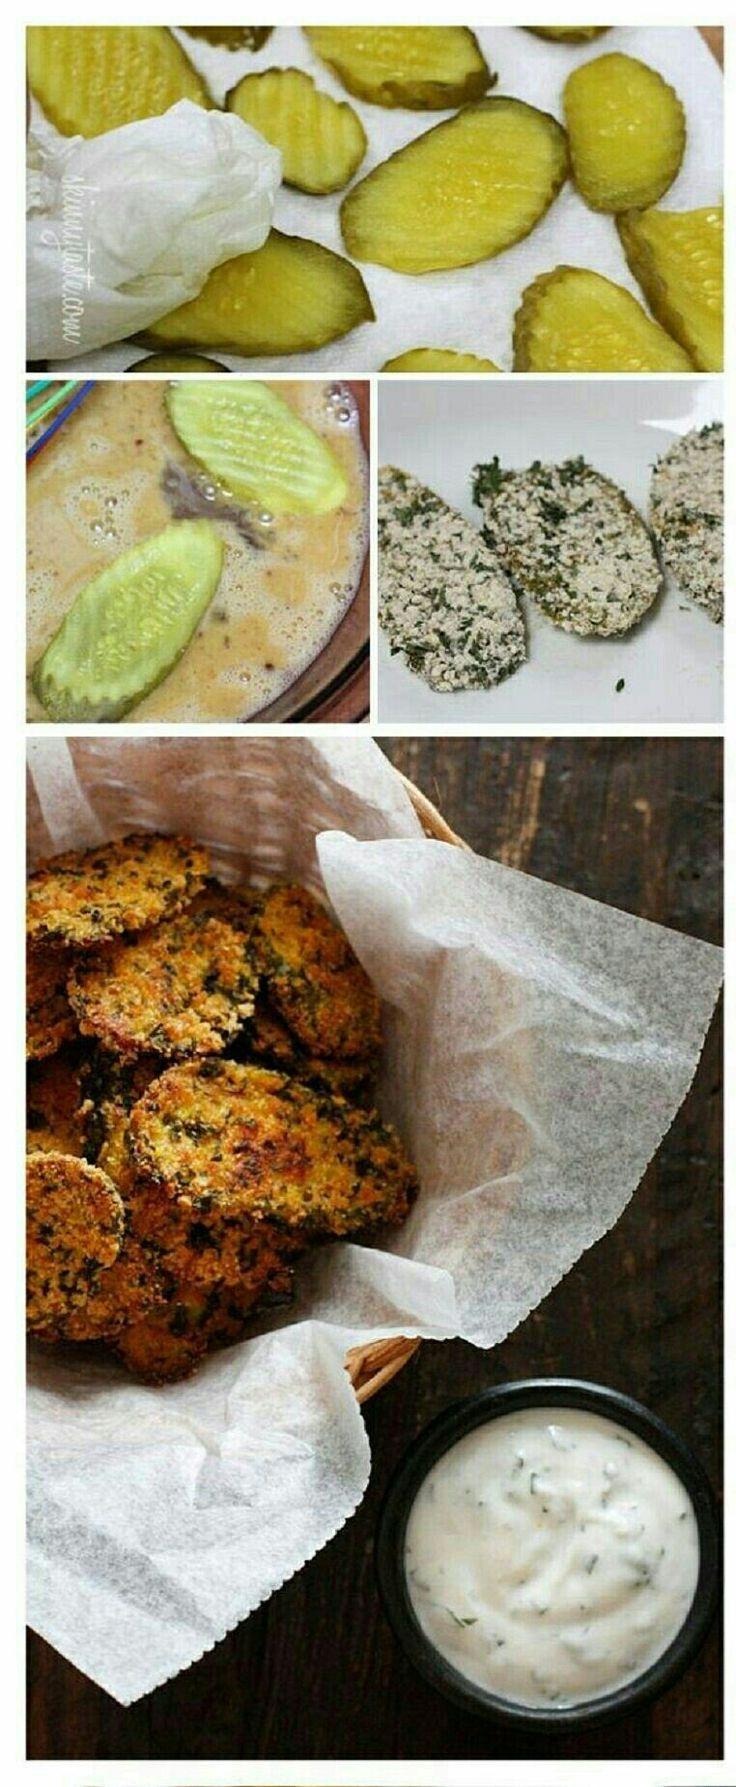 A delicious idea to celebrate the #SuperBowl. #SuperBowlSnacks #Recipes #Snacks #SuperBowlTreats